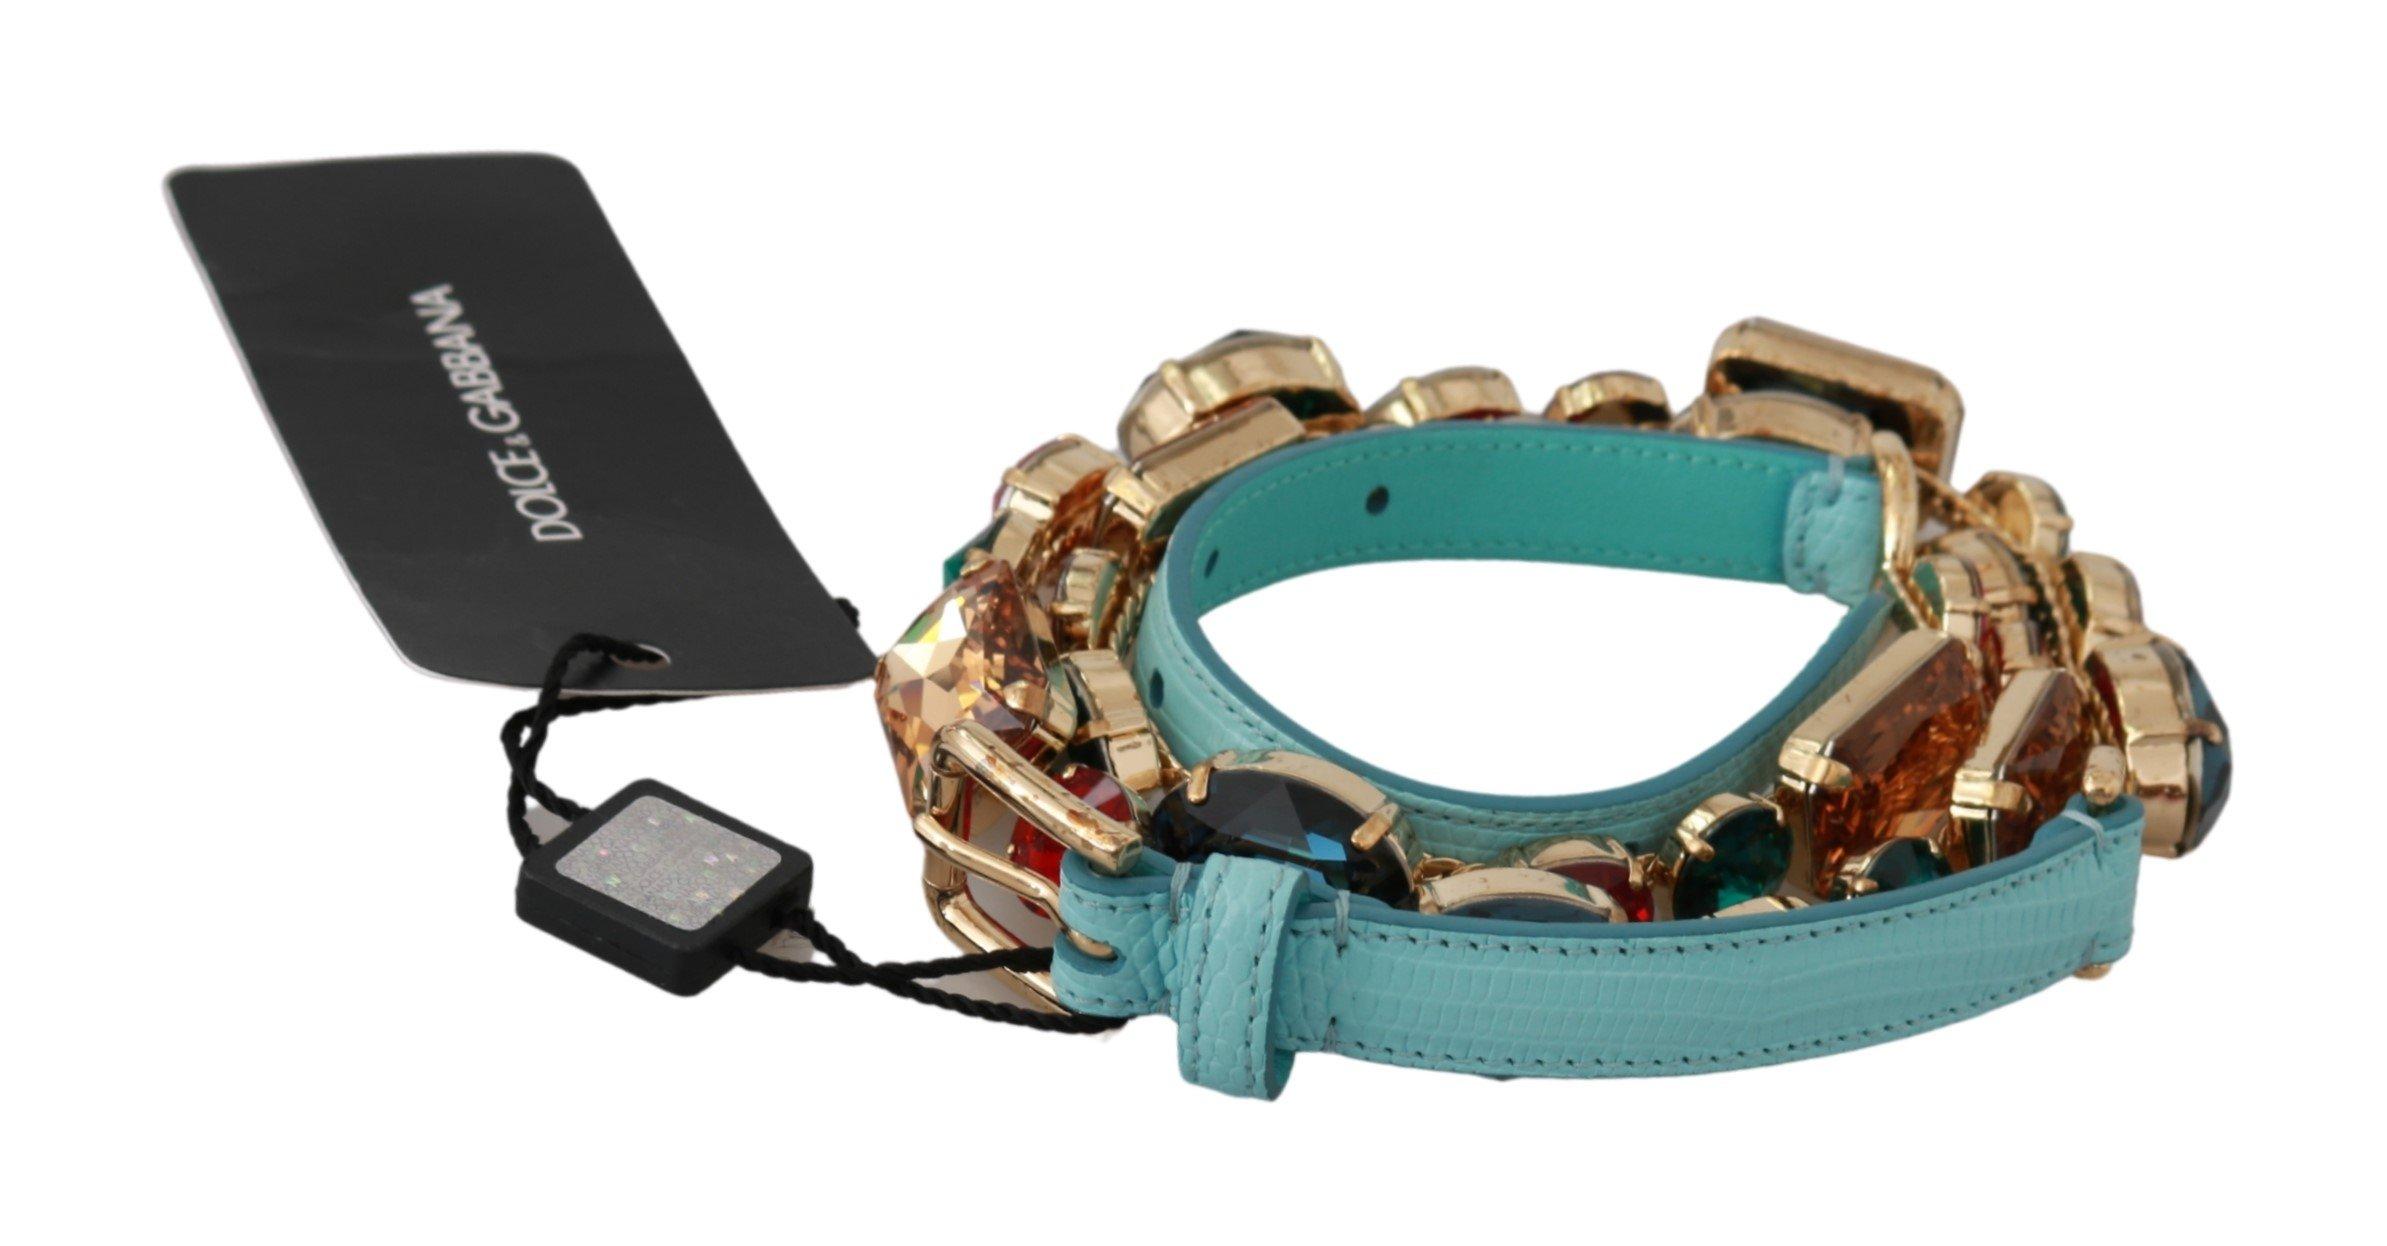 Dolce & Gabbana Women's Leather Crystals Waist Belt Blue BEL60581 - 70 cm / 28 Inches